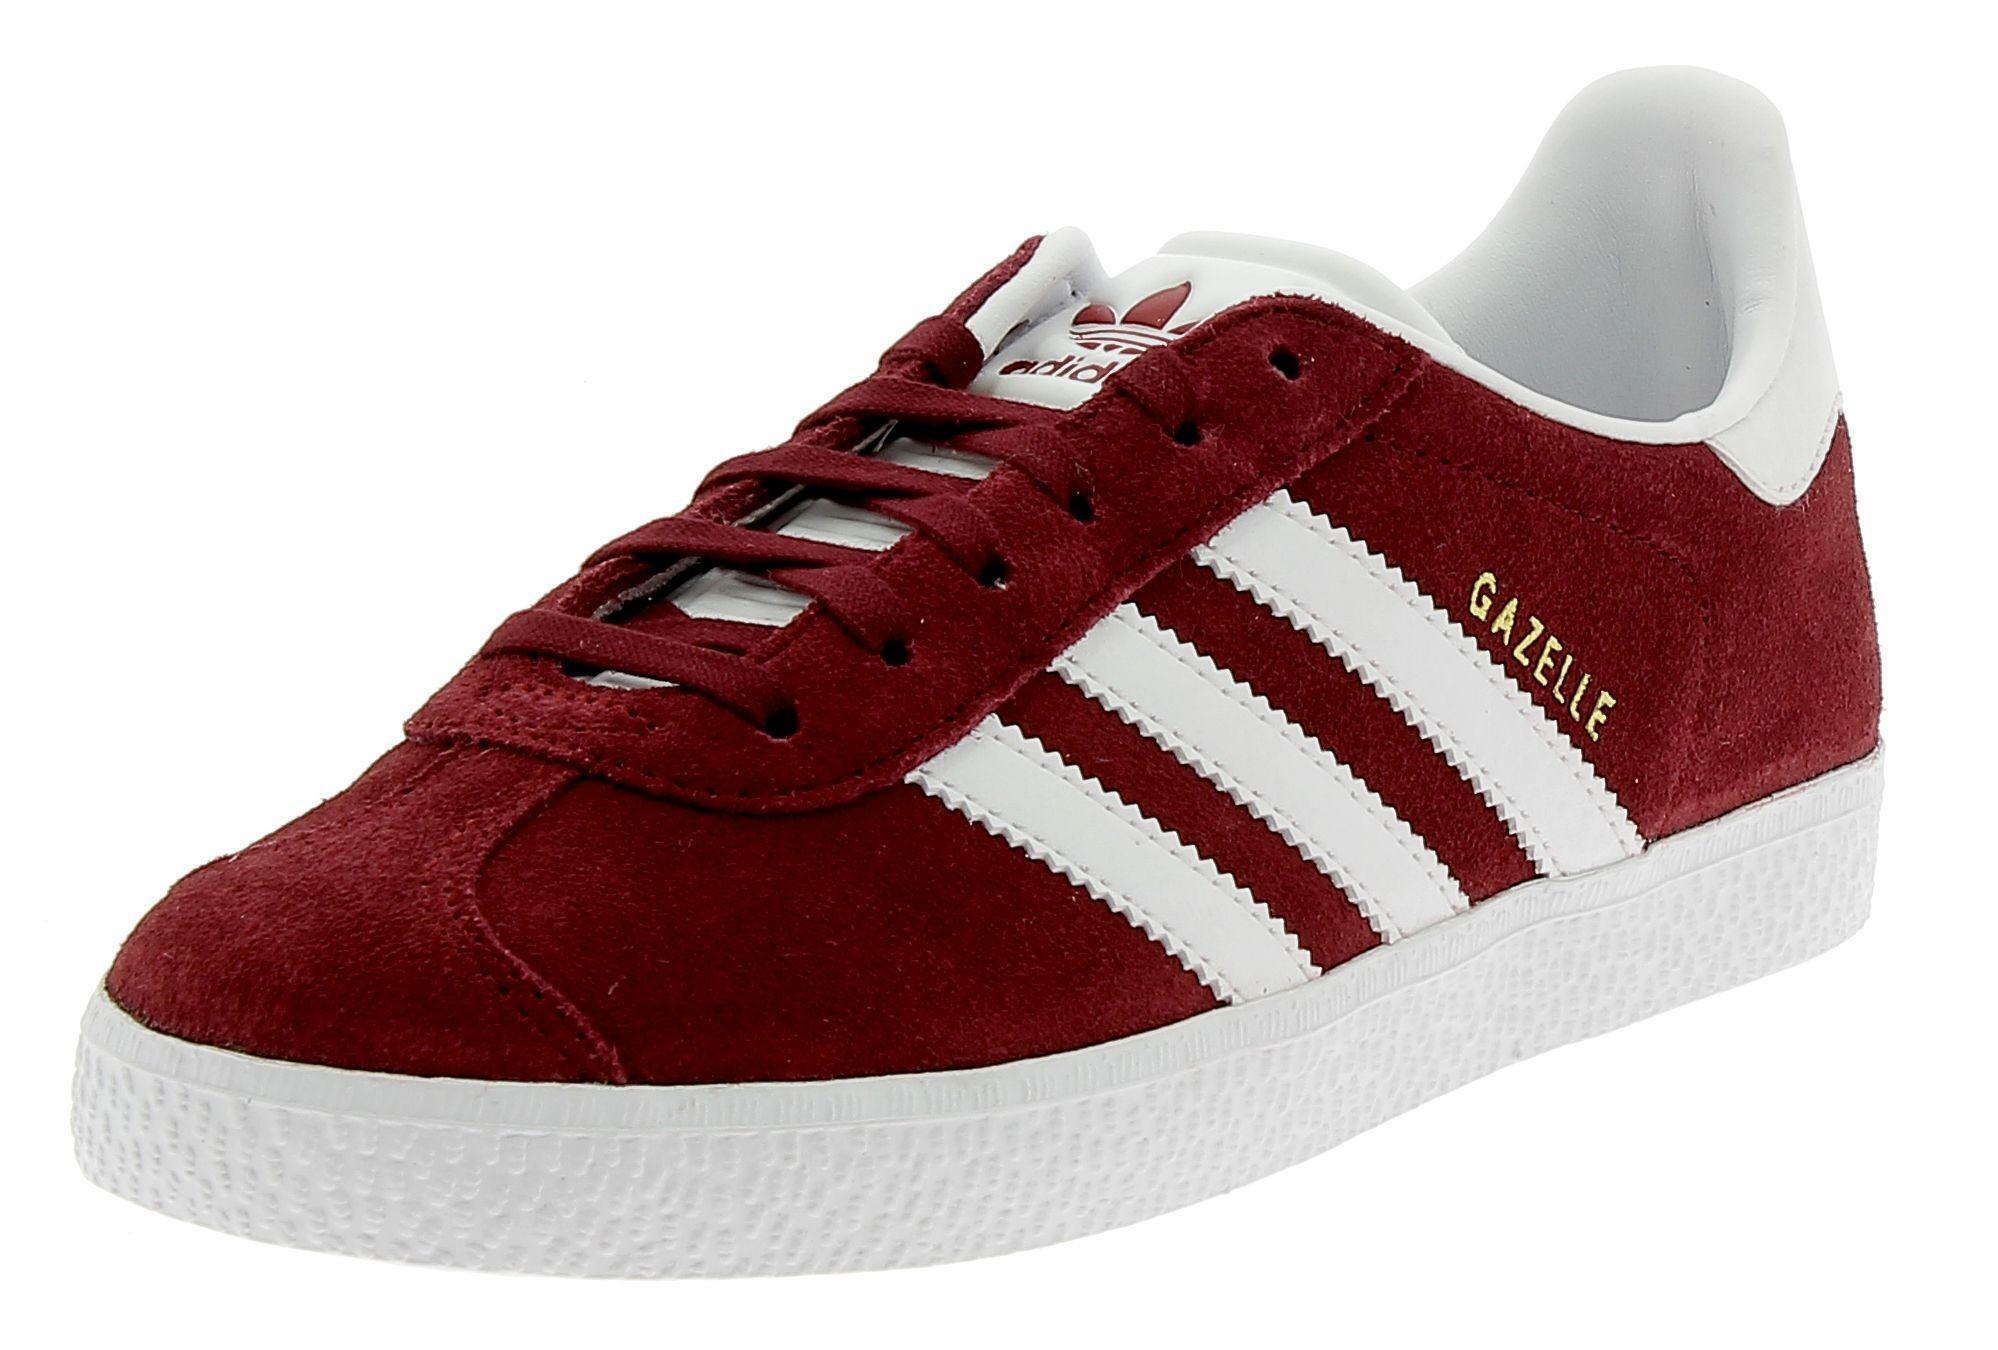 ADIDAS Gazelle J Bordeaux Sports Shoes | eBay